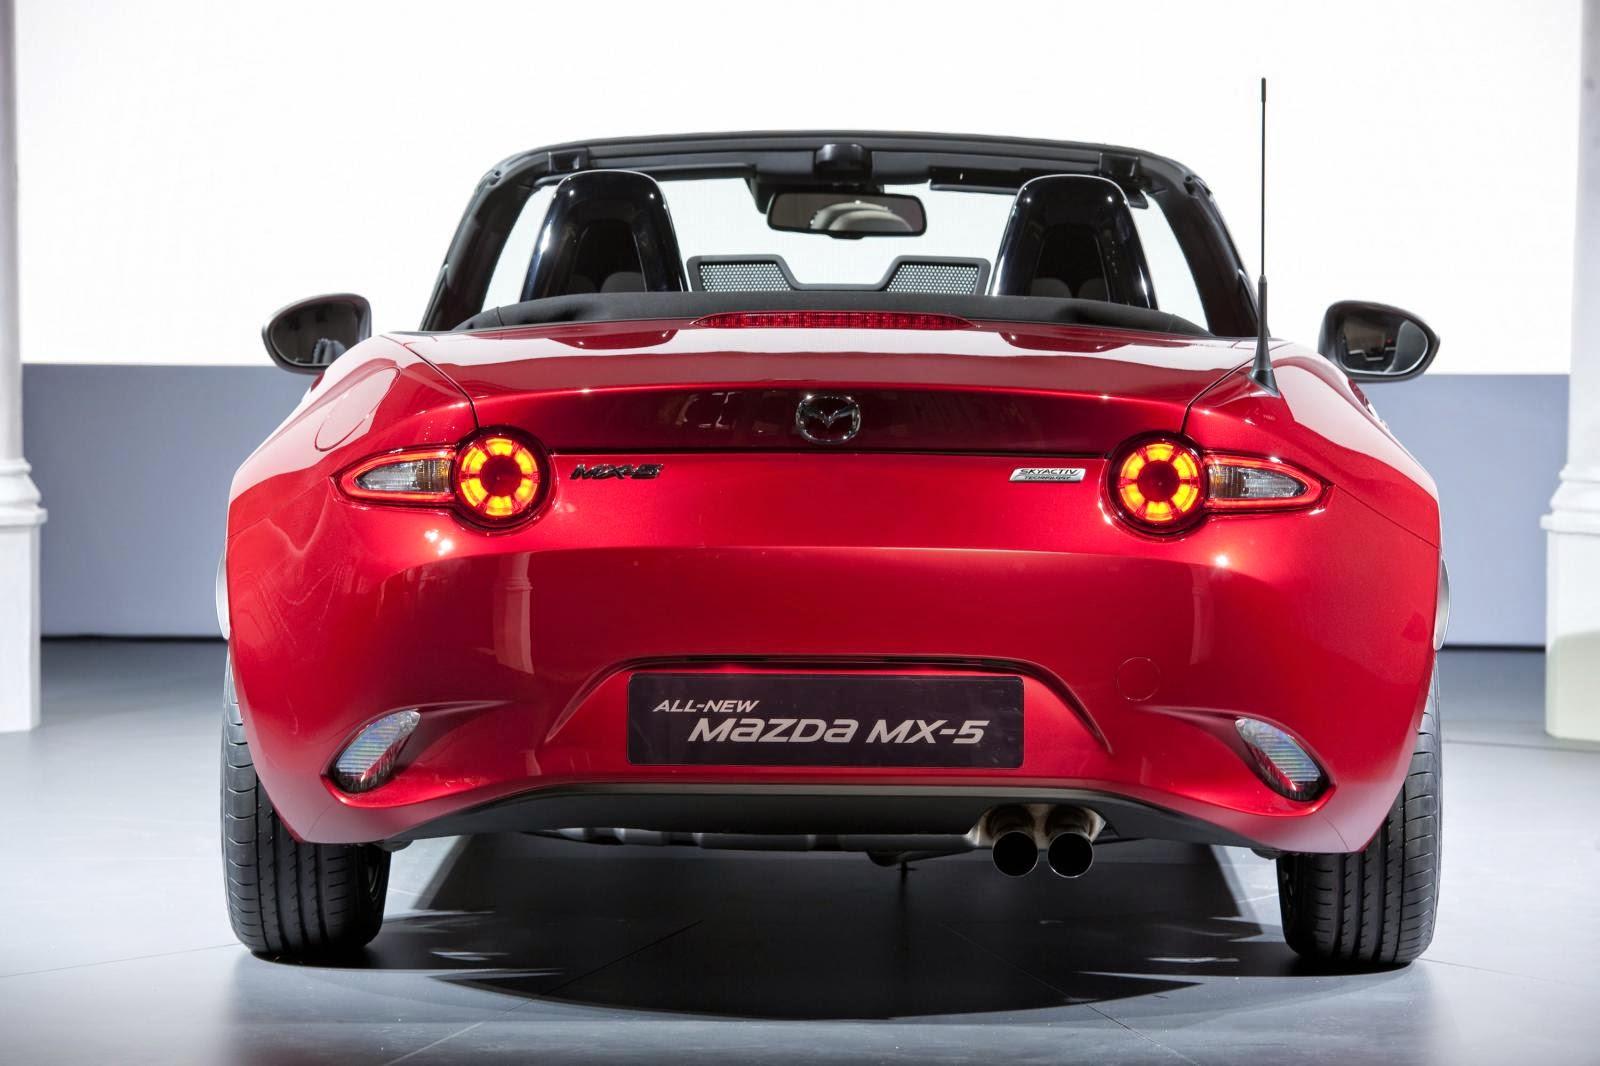 صور سيارة مازدا MX-5 2016 Photo Mazda MX-5 2016